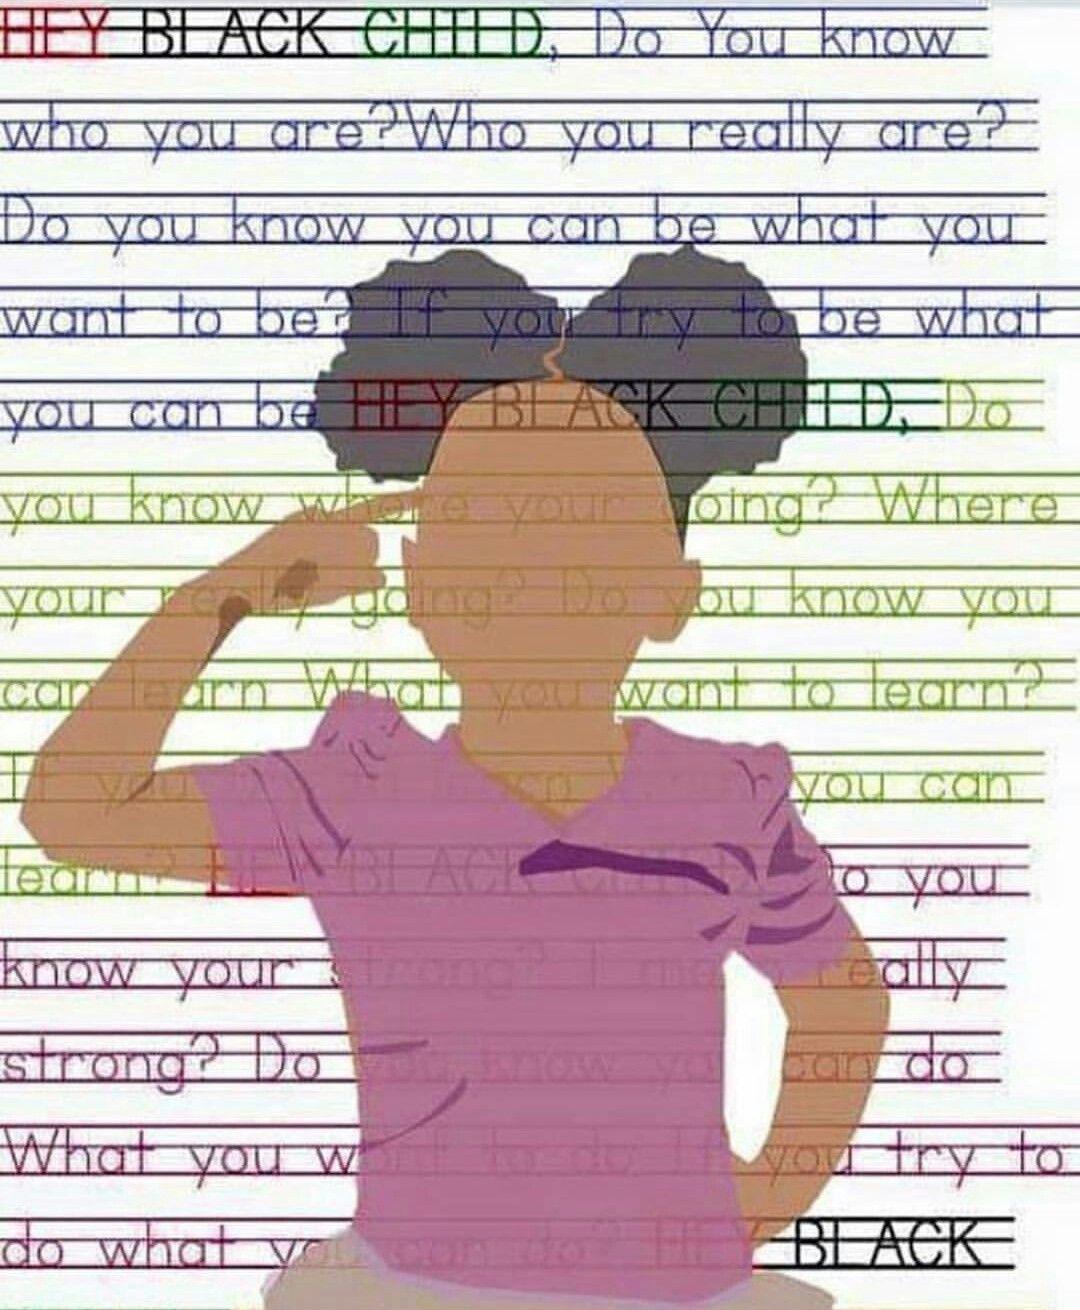 Black Child Poem : black, child, Black, Child, Countee, Cullen, Poem,, Positive, Affirmations, Kids,, Poems